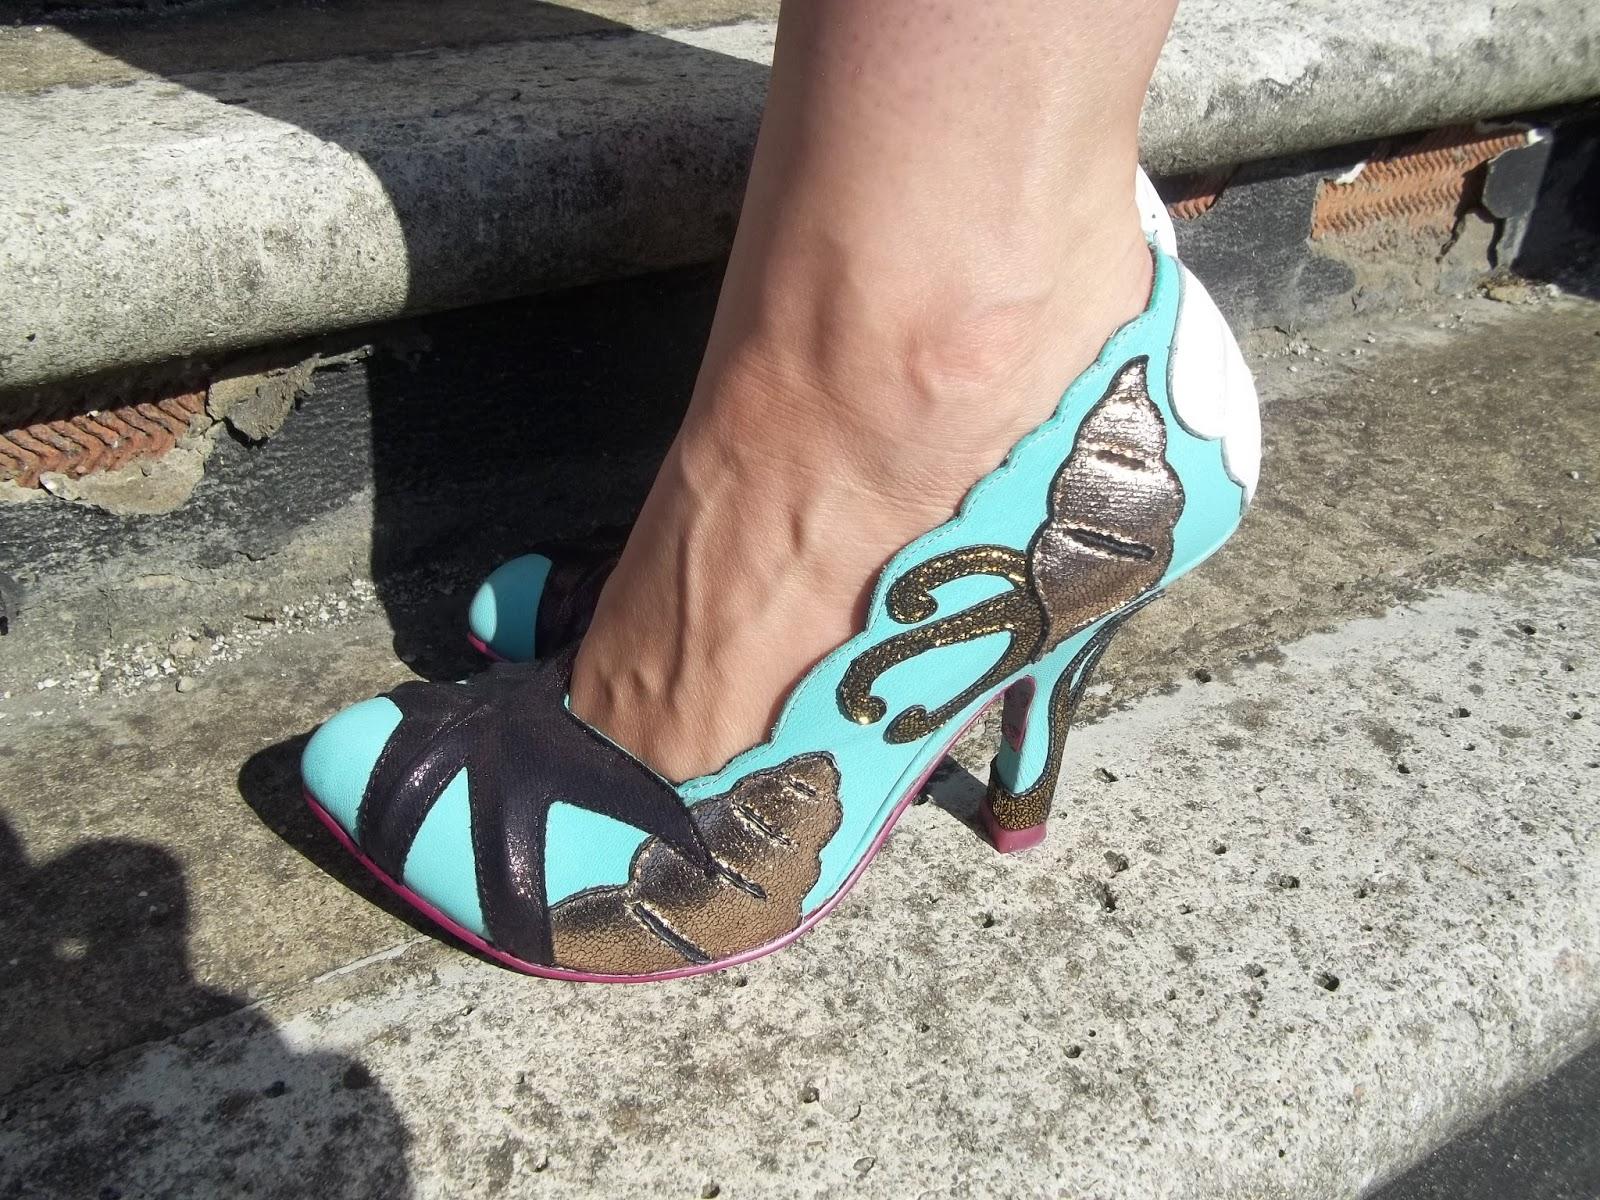 shoe heel boot or Lick or